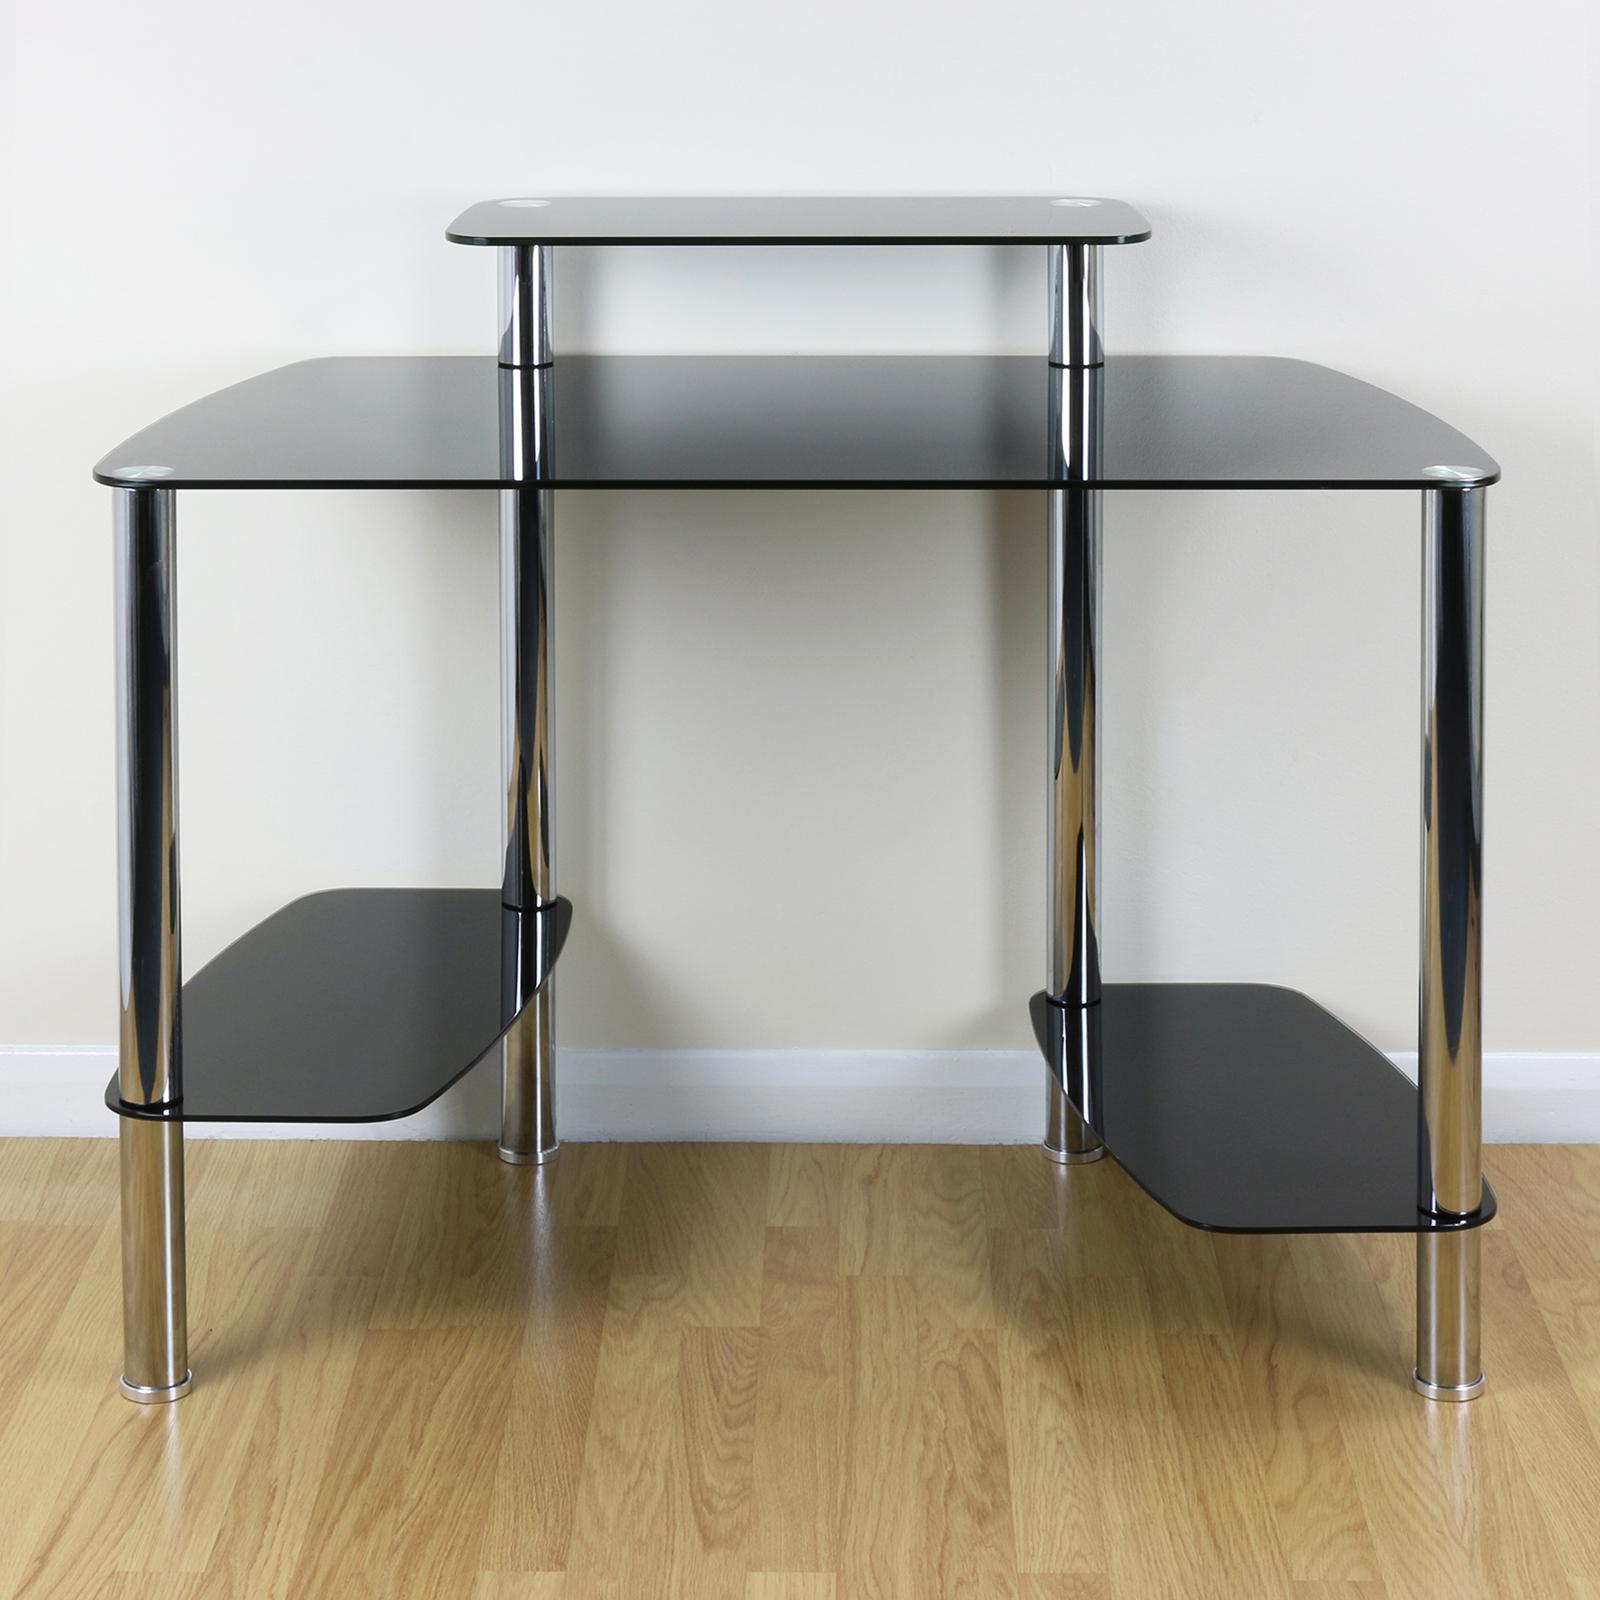 Sentinel Large Black Gl Office Computer Pc Desk Stand Cpu Tower Shelf Monitor Riser